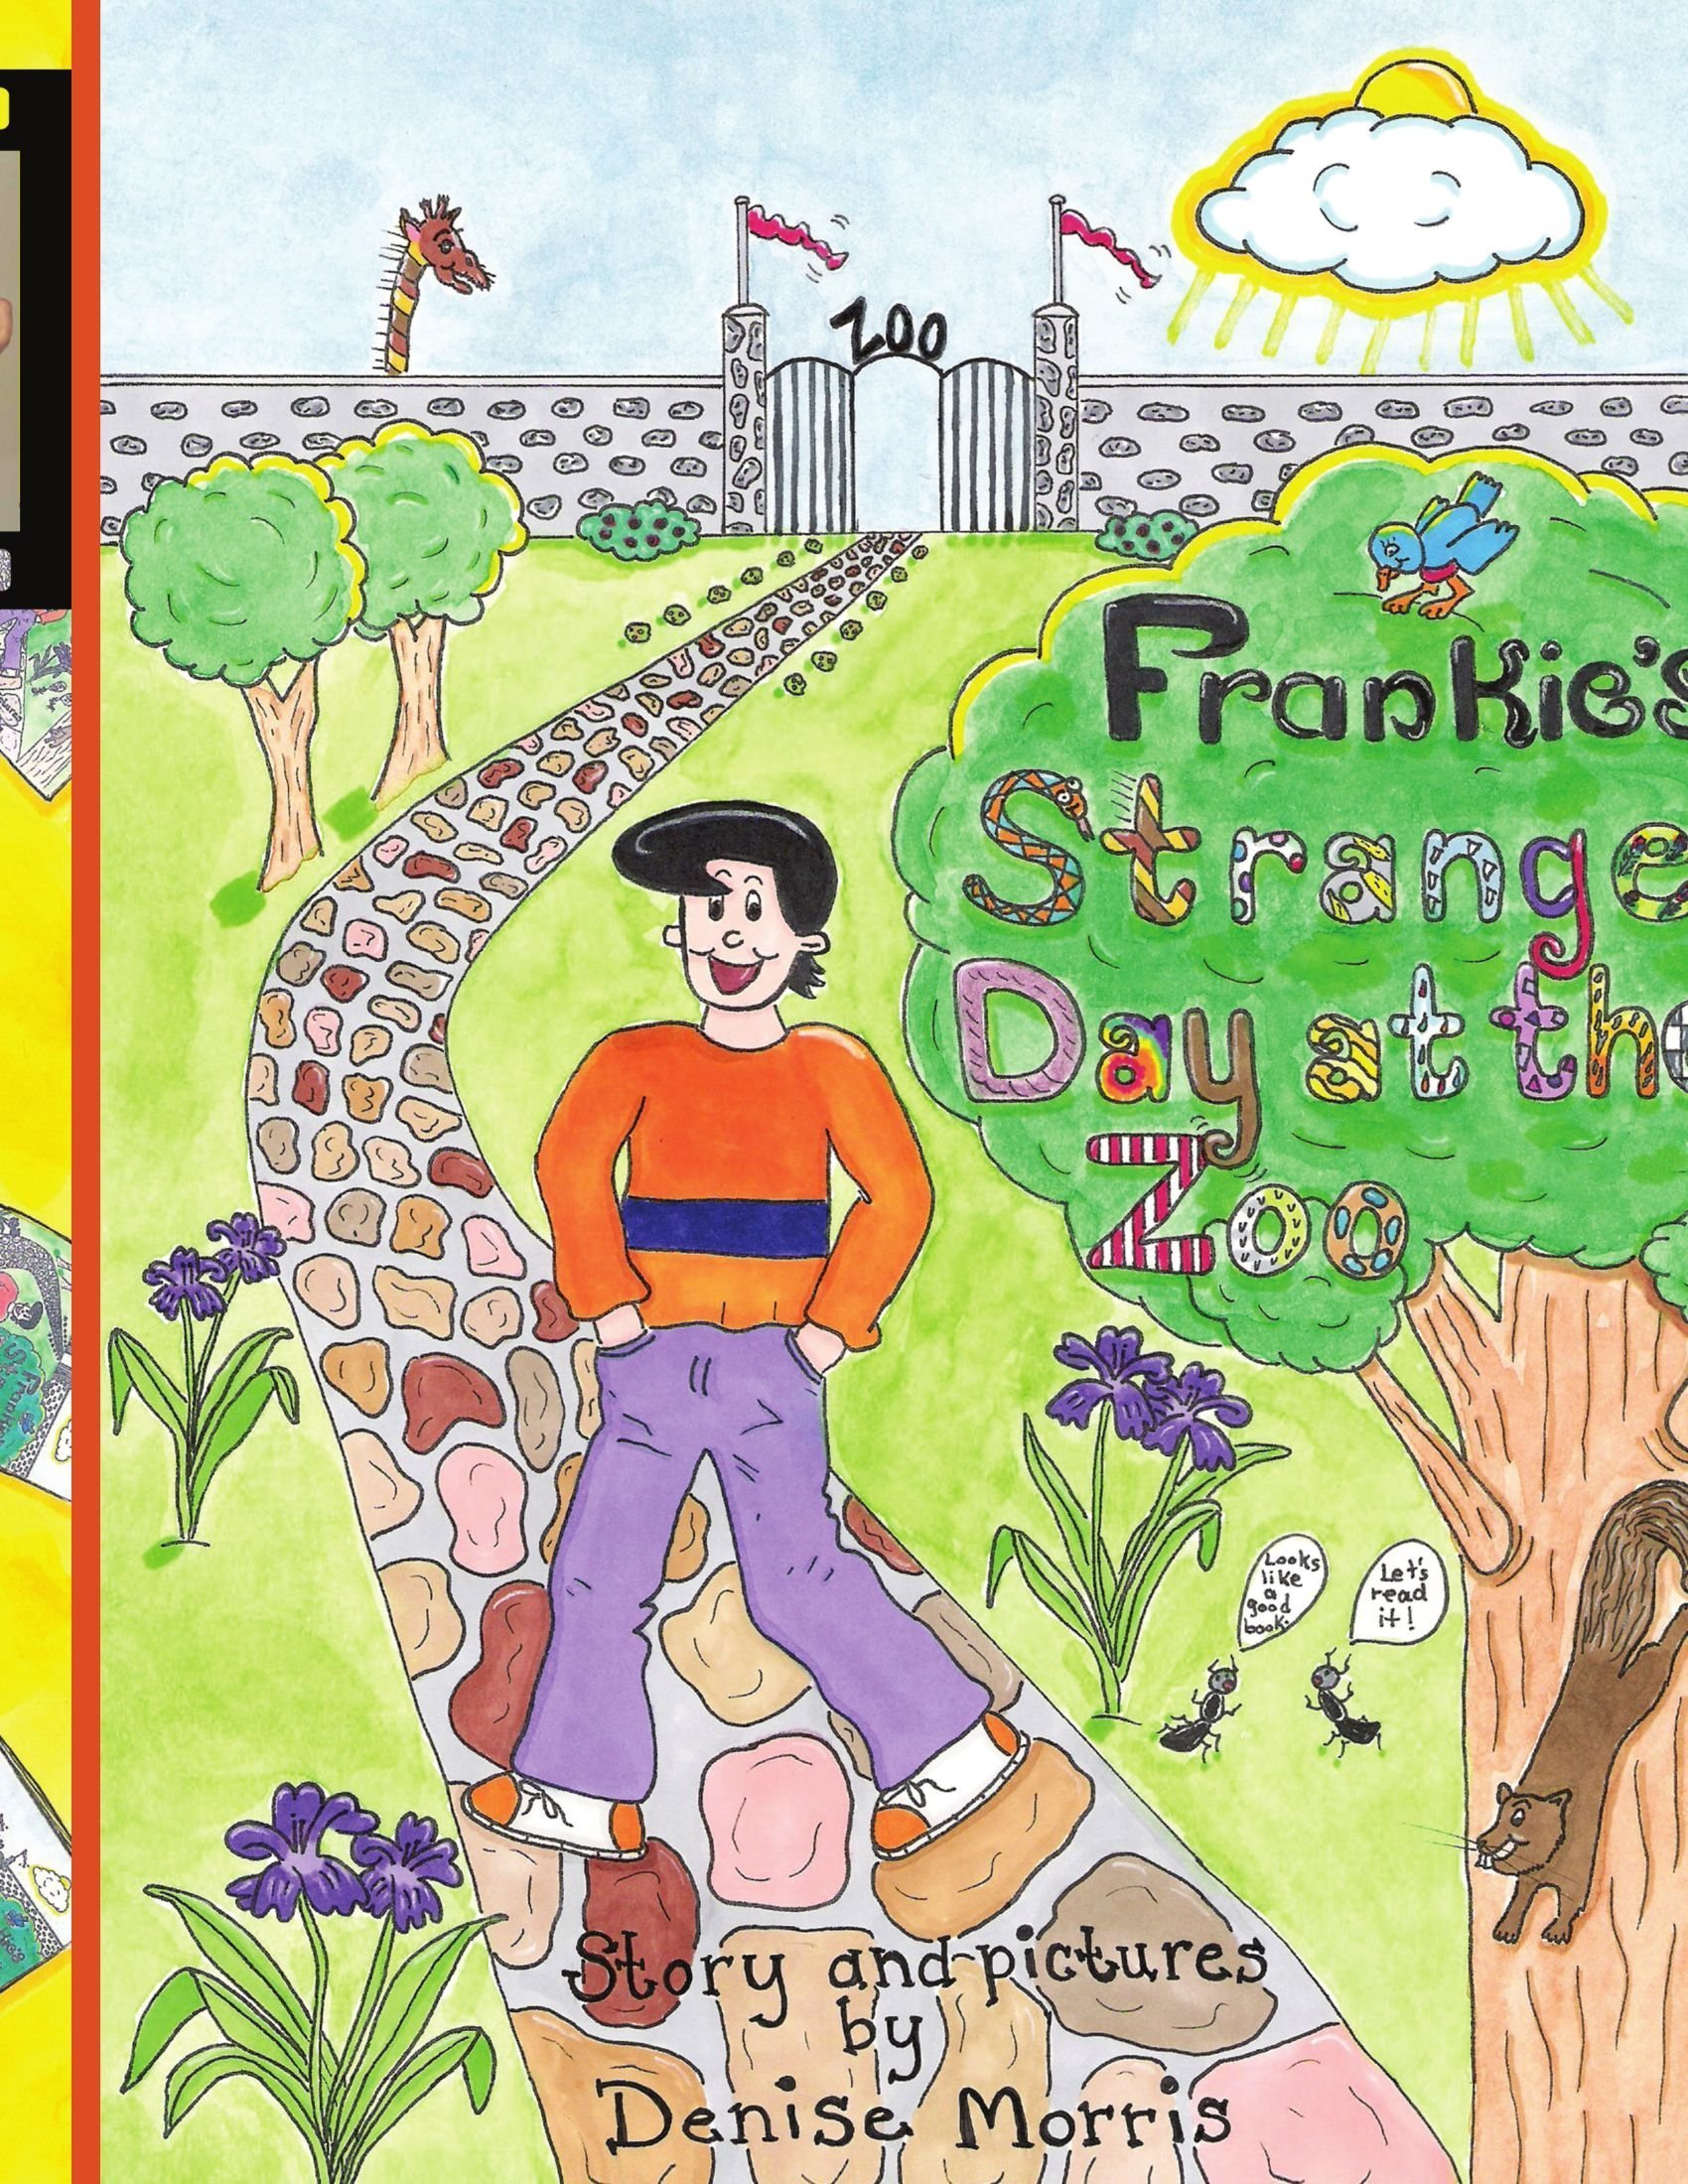 Frankie's Strange Day at the Zoo ePub fb2 ebook